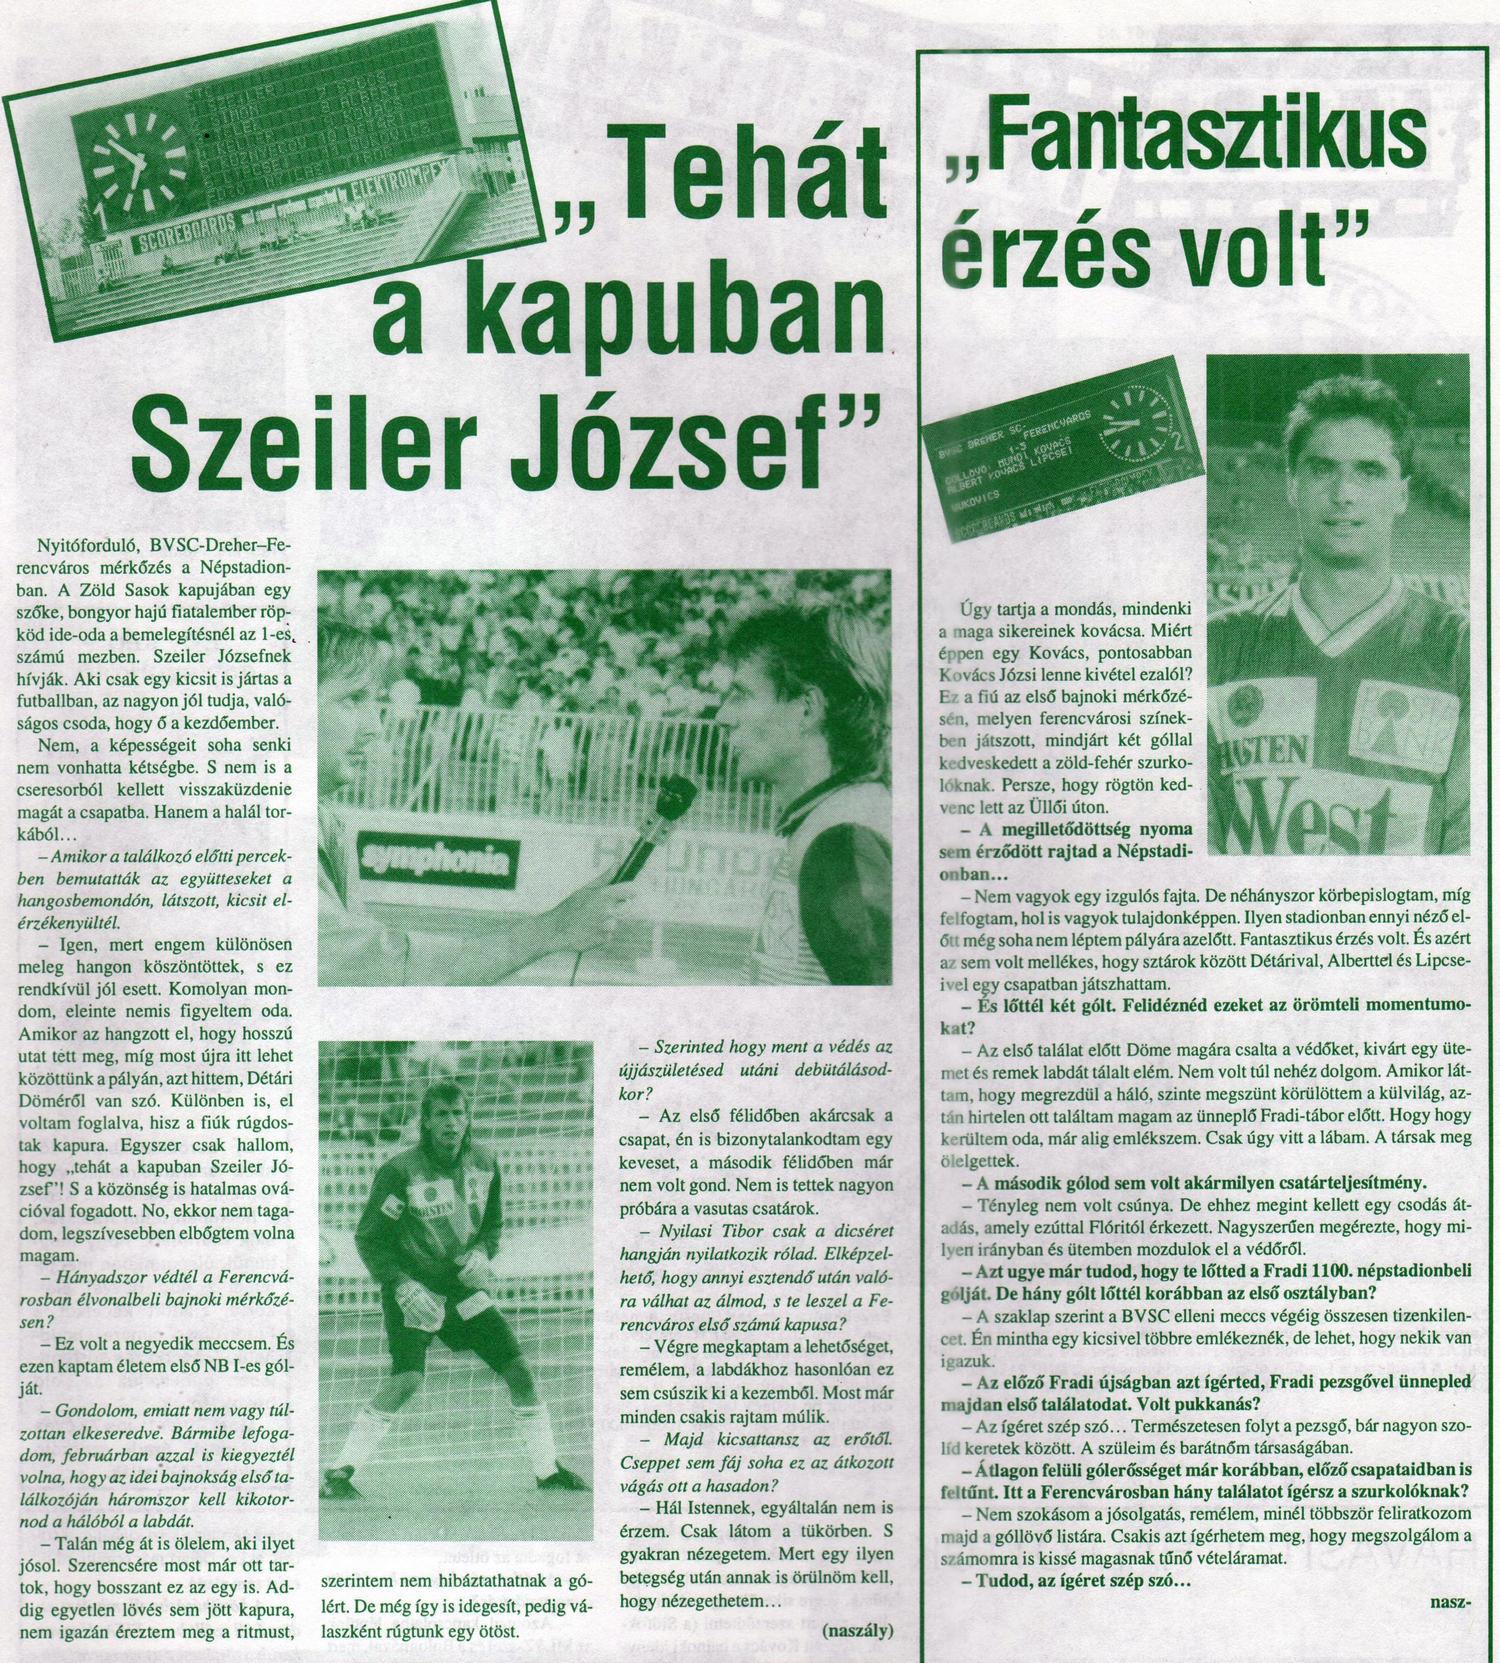 TFU_19930900_FU_010 - 0005